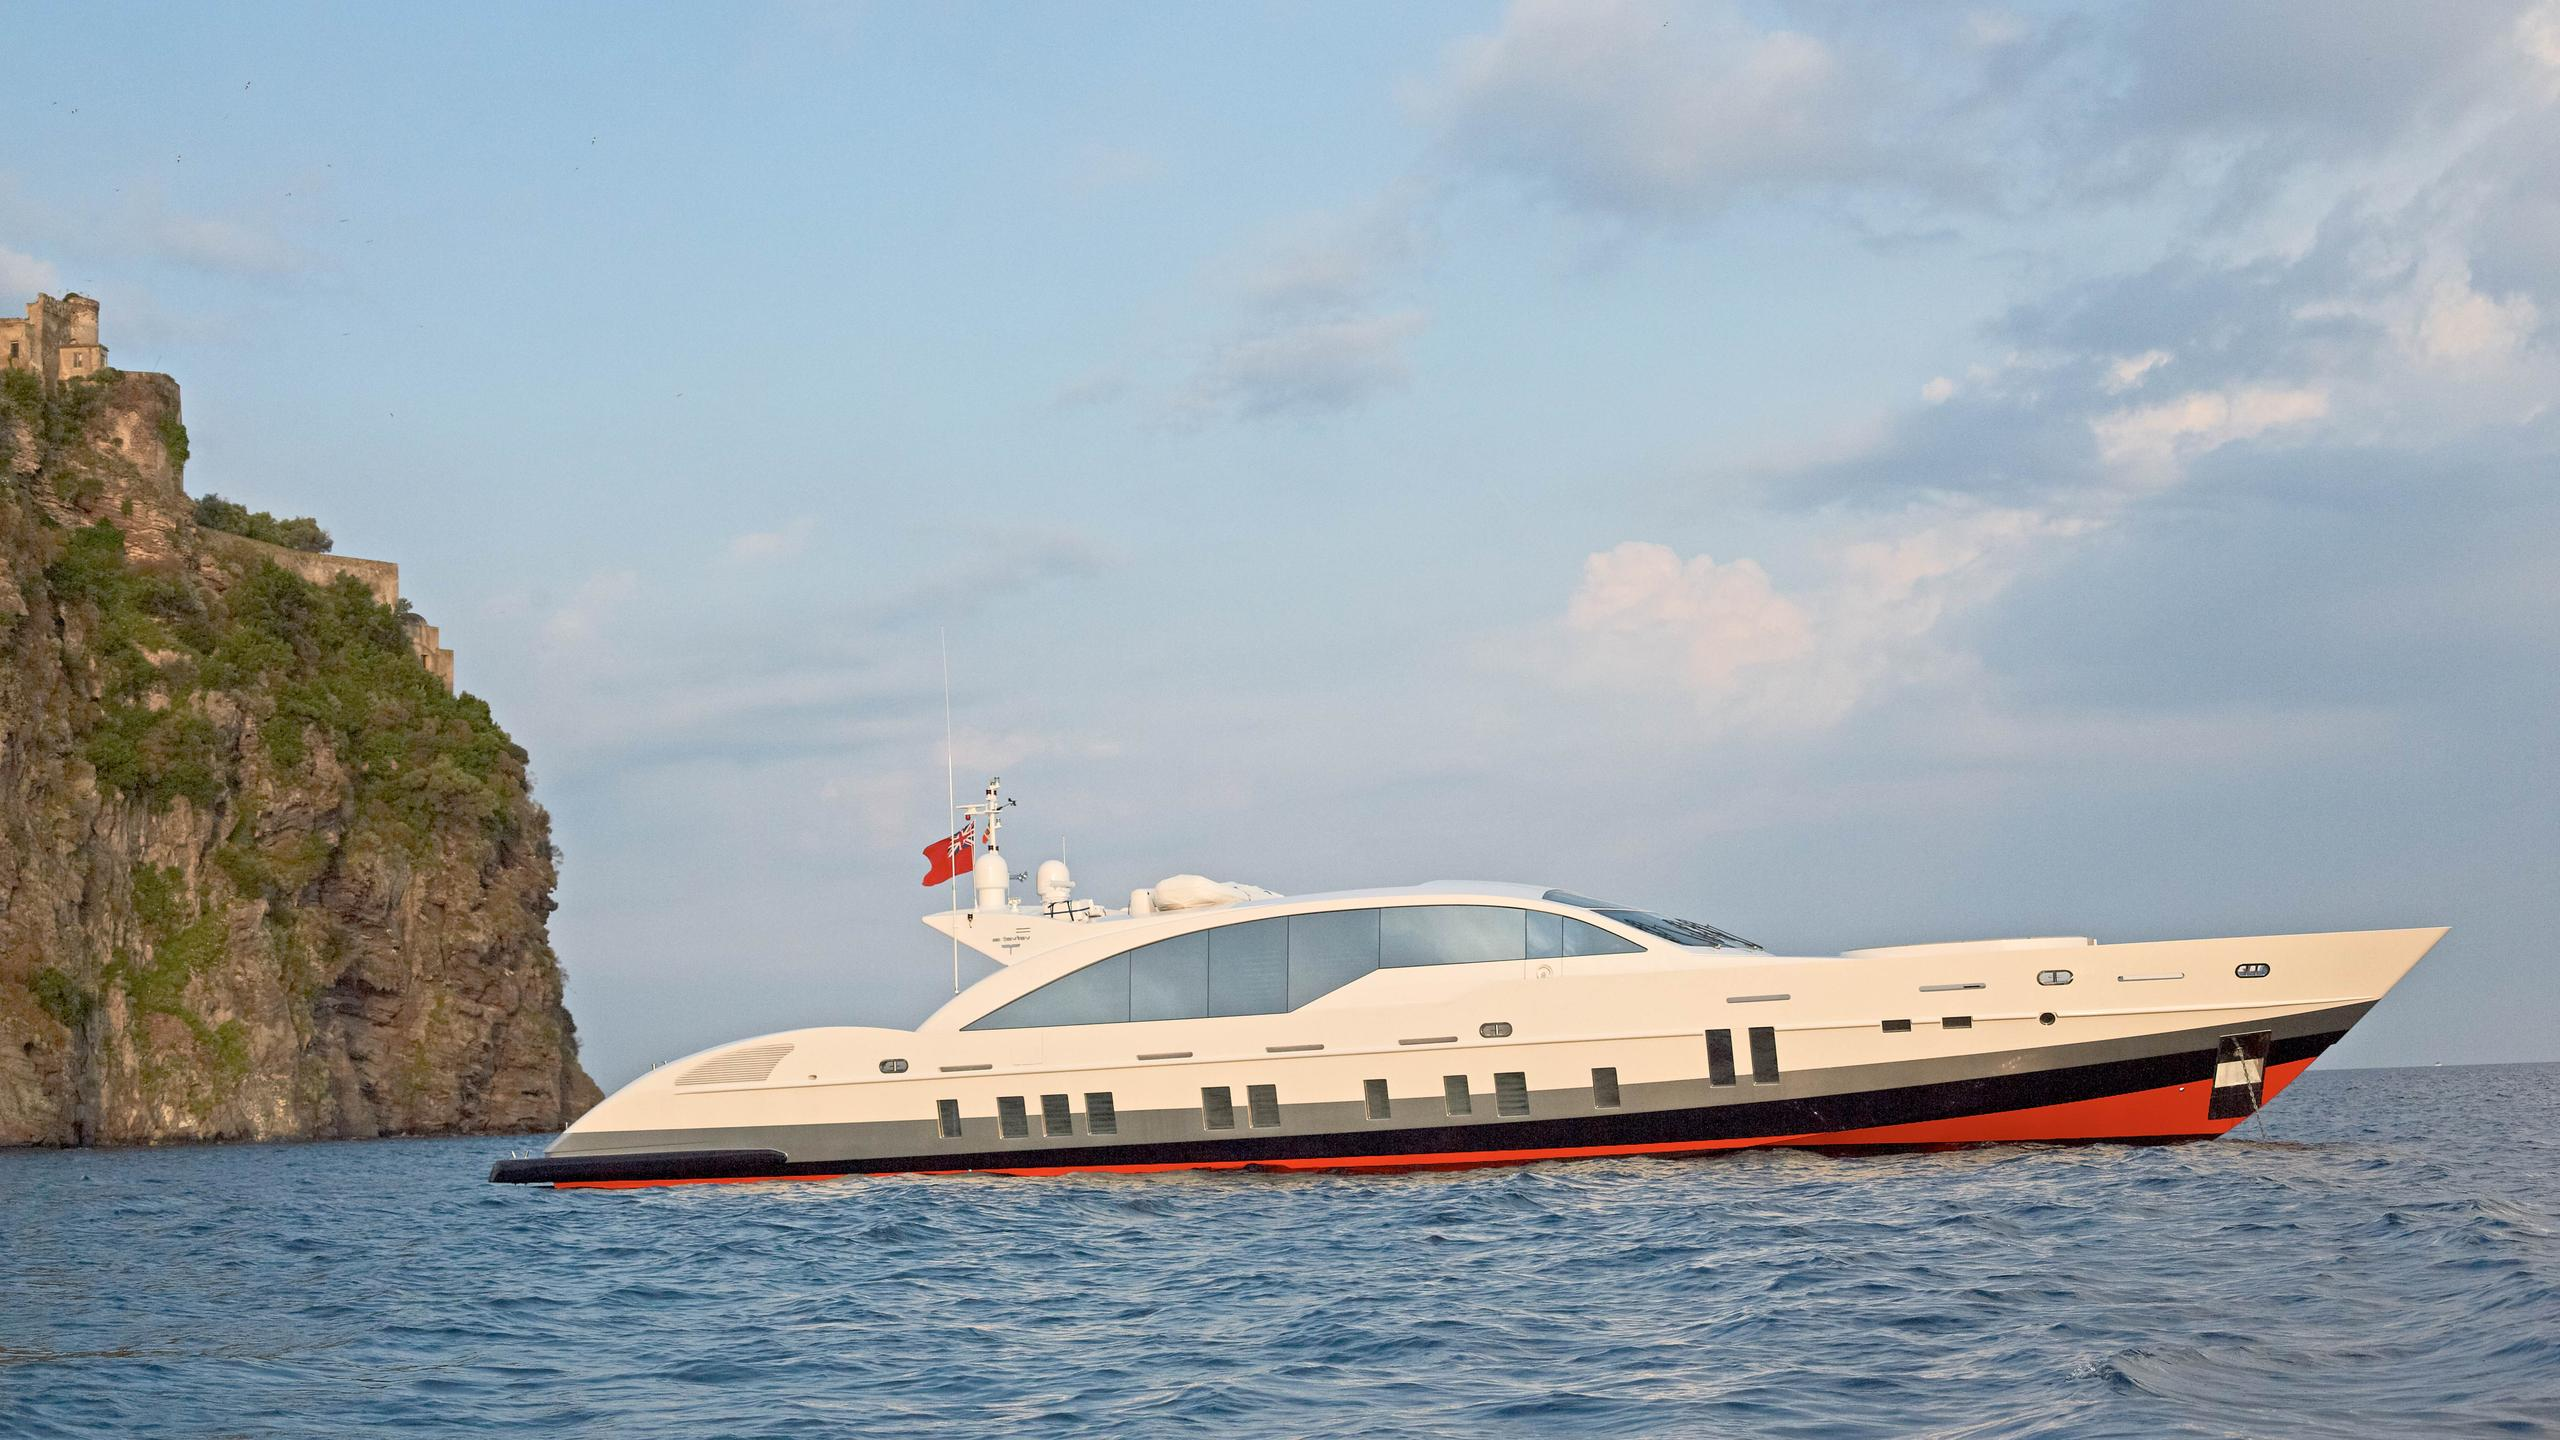 double-shot-motor-yacht-tenomar-2011-36m-profile